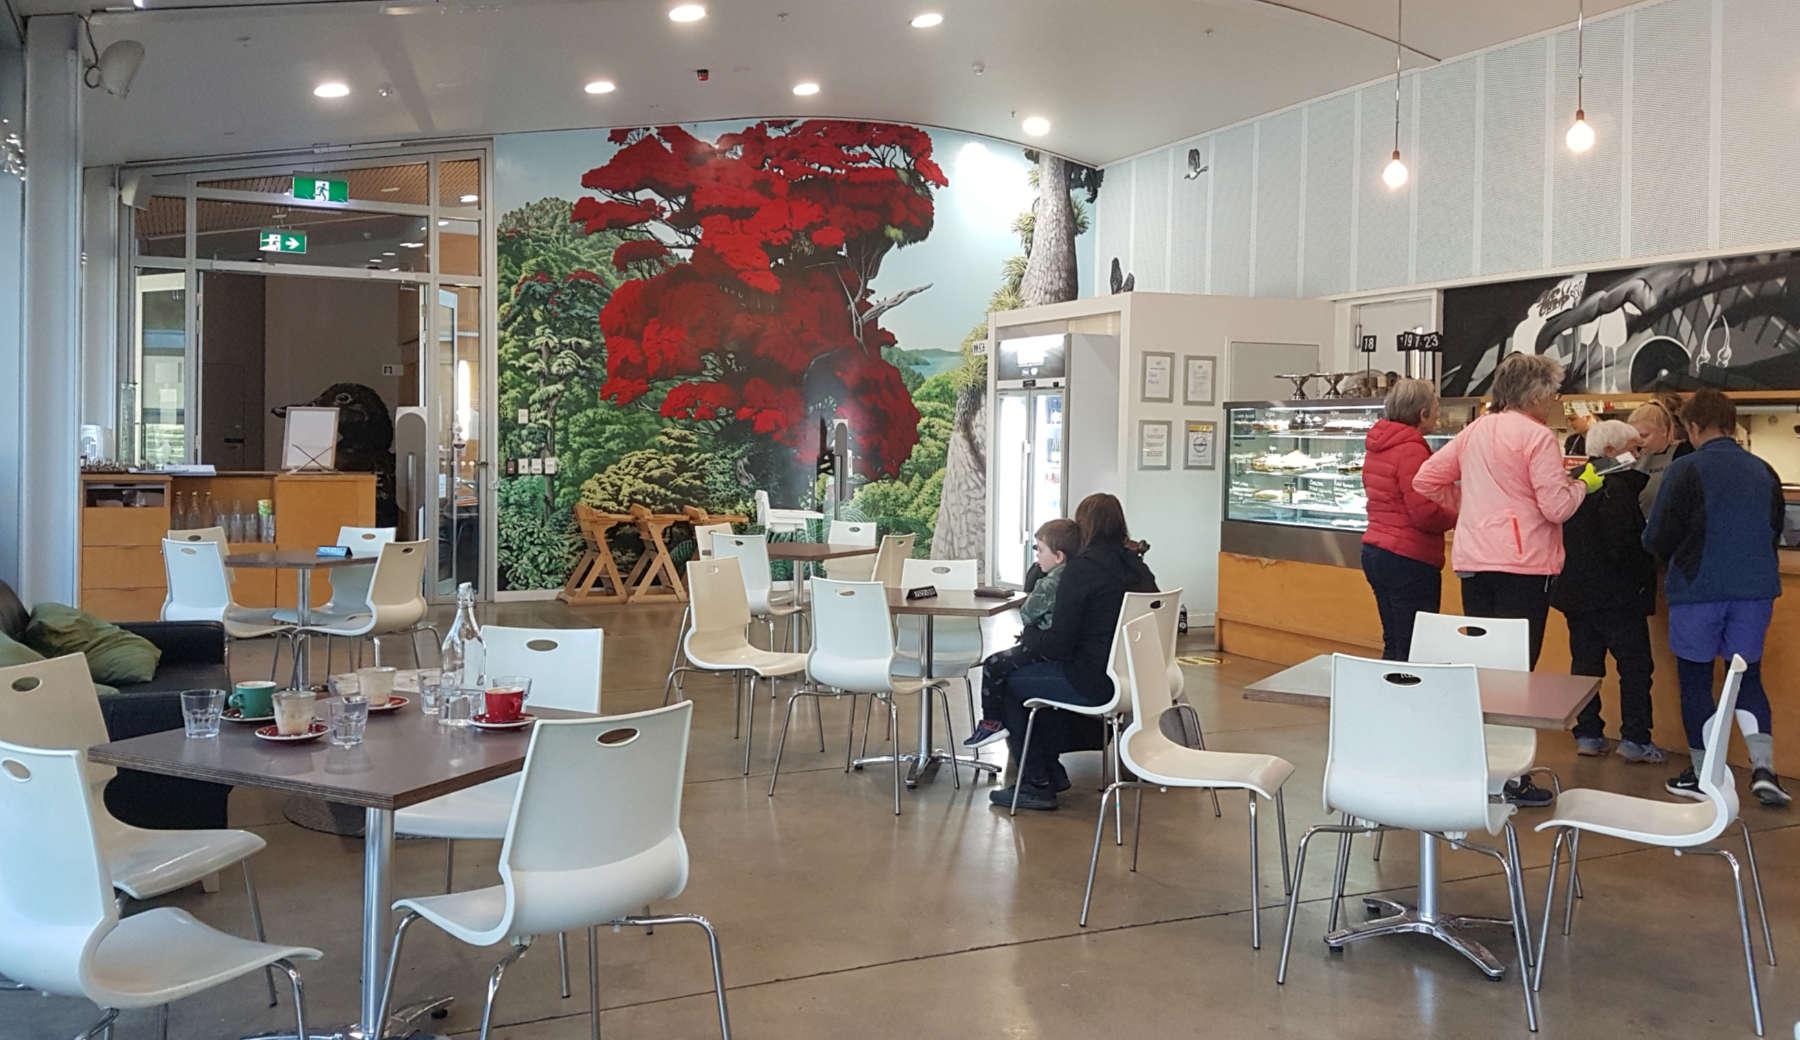 Rata cafe interior view to counter